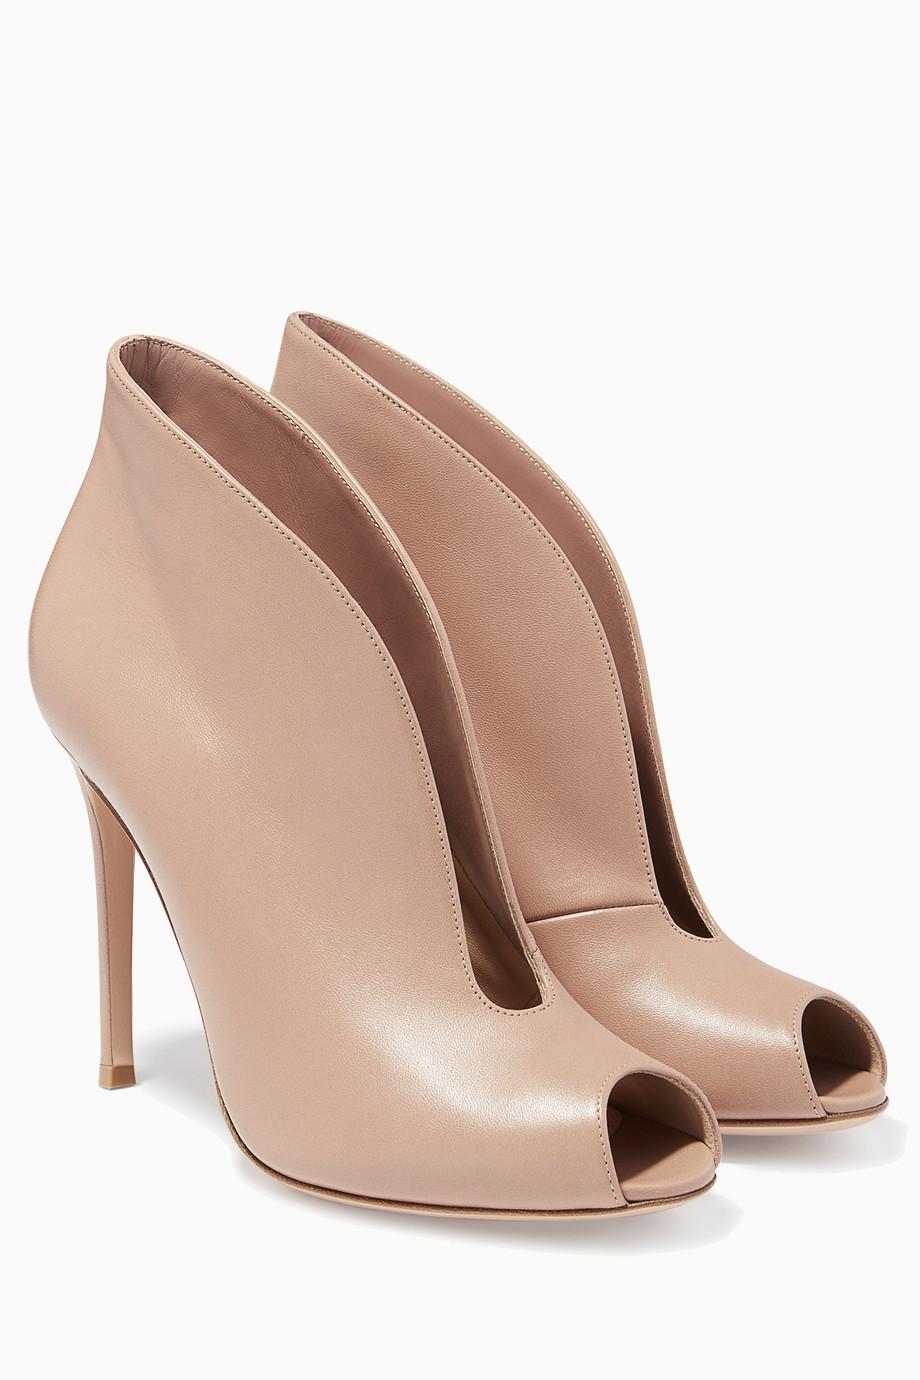 4ddef28f7deb Shop Gianvito Rossi Brown Tan Peep-toe Boot for Women